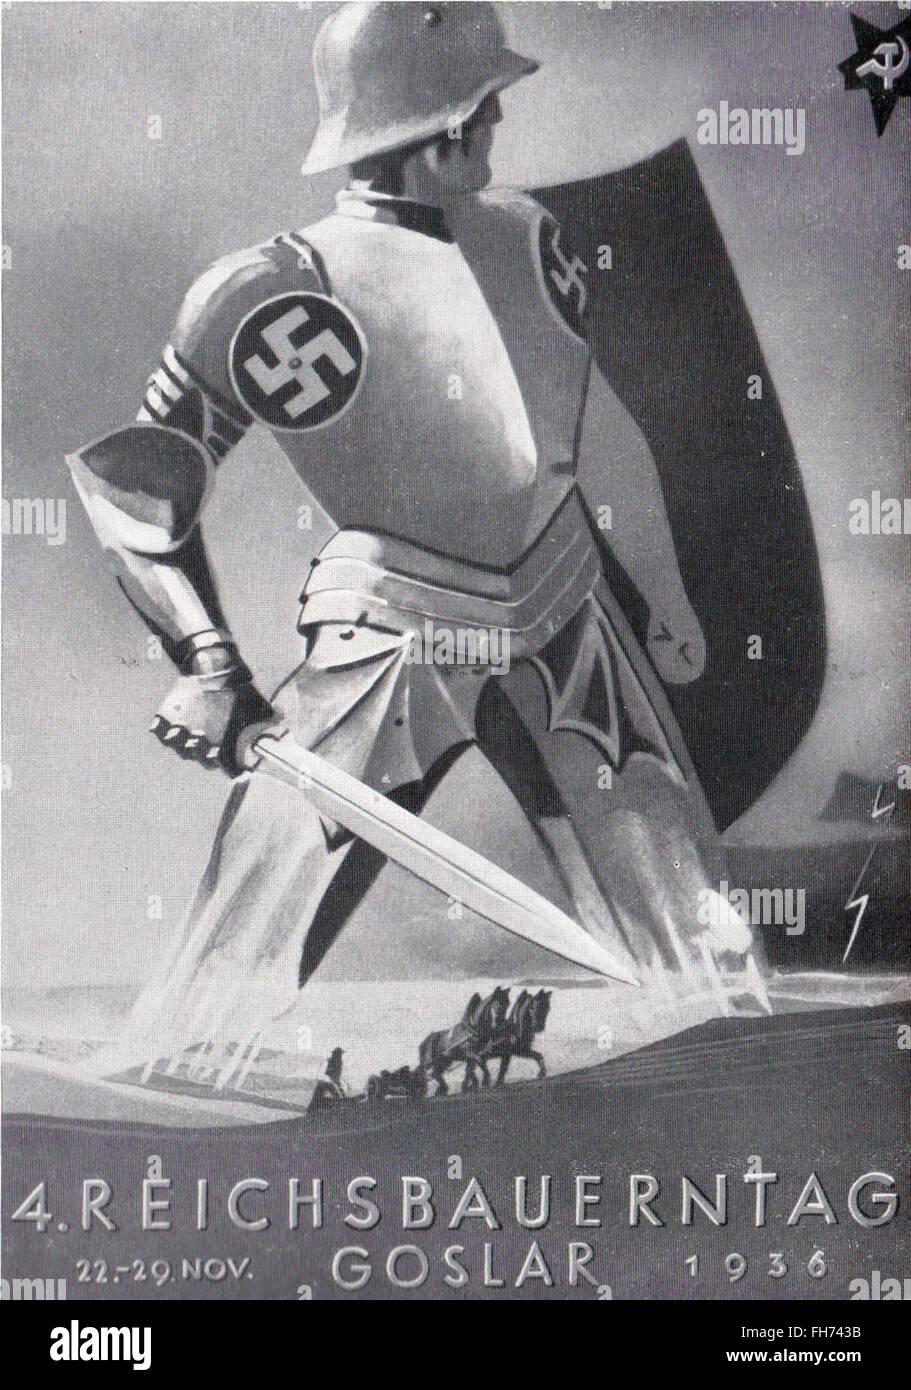 Nazi Propaganda Stock Photos & Nazi Propaganda Stock Images - Alamy